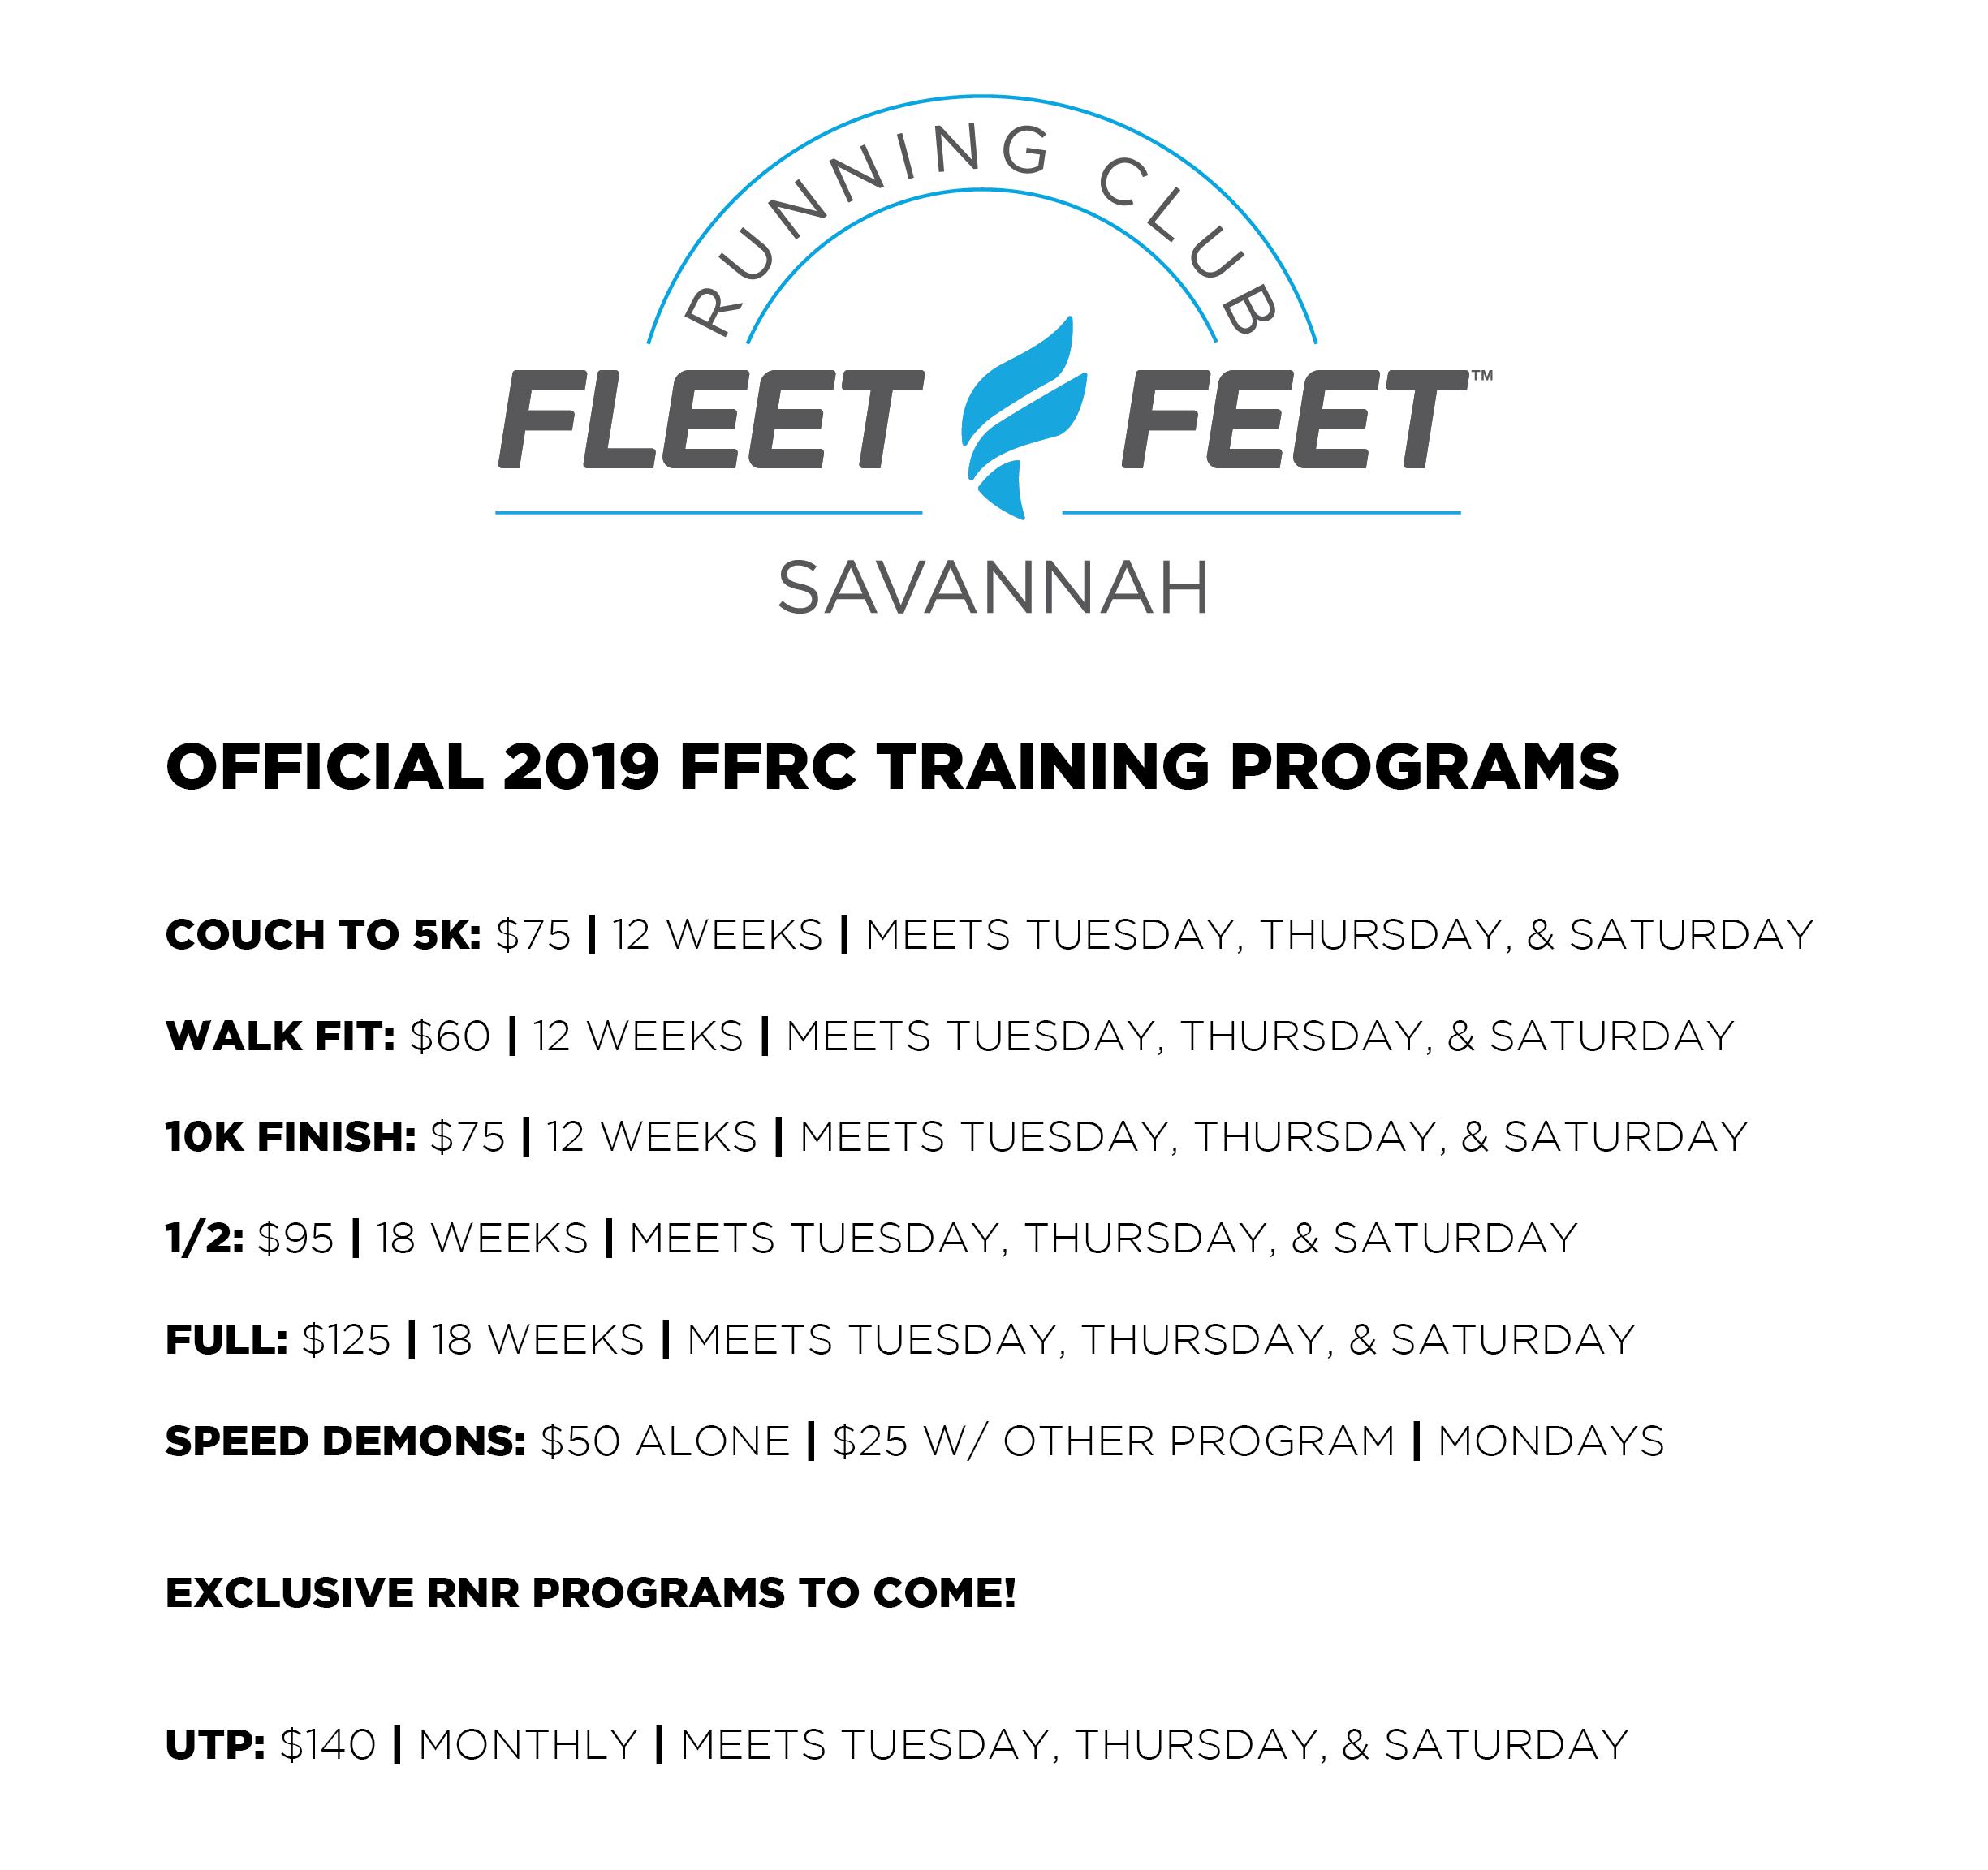 2019 FFRC TRAINING PROGRAMS